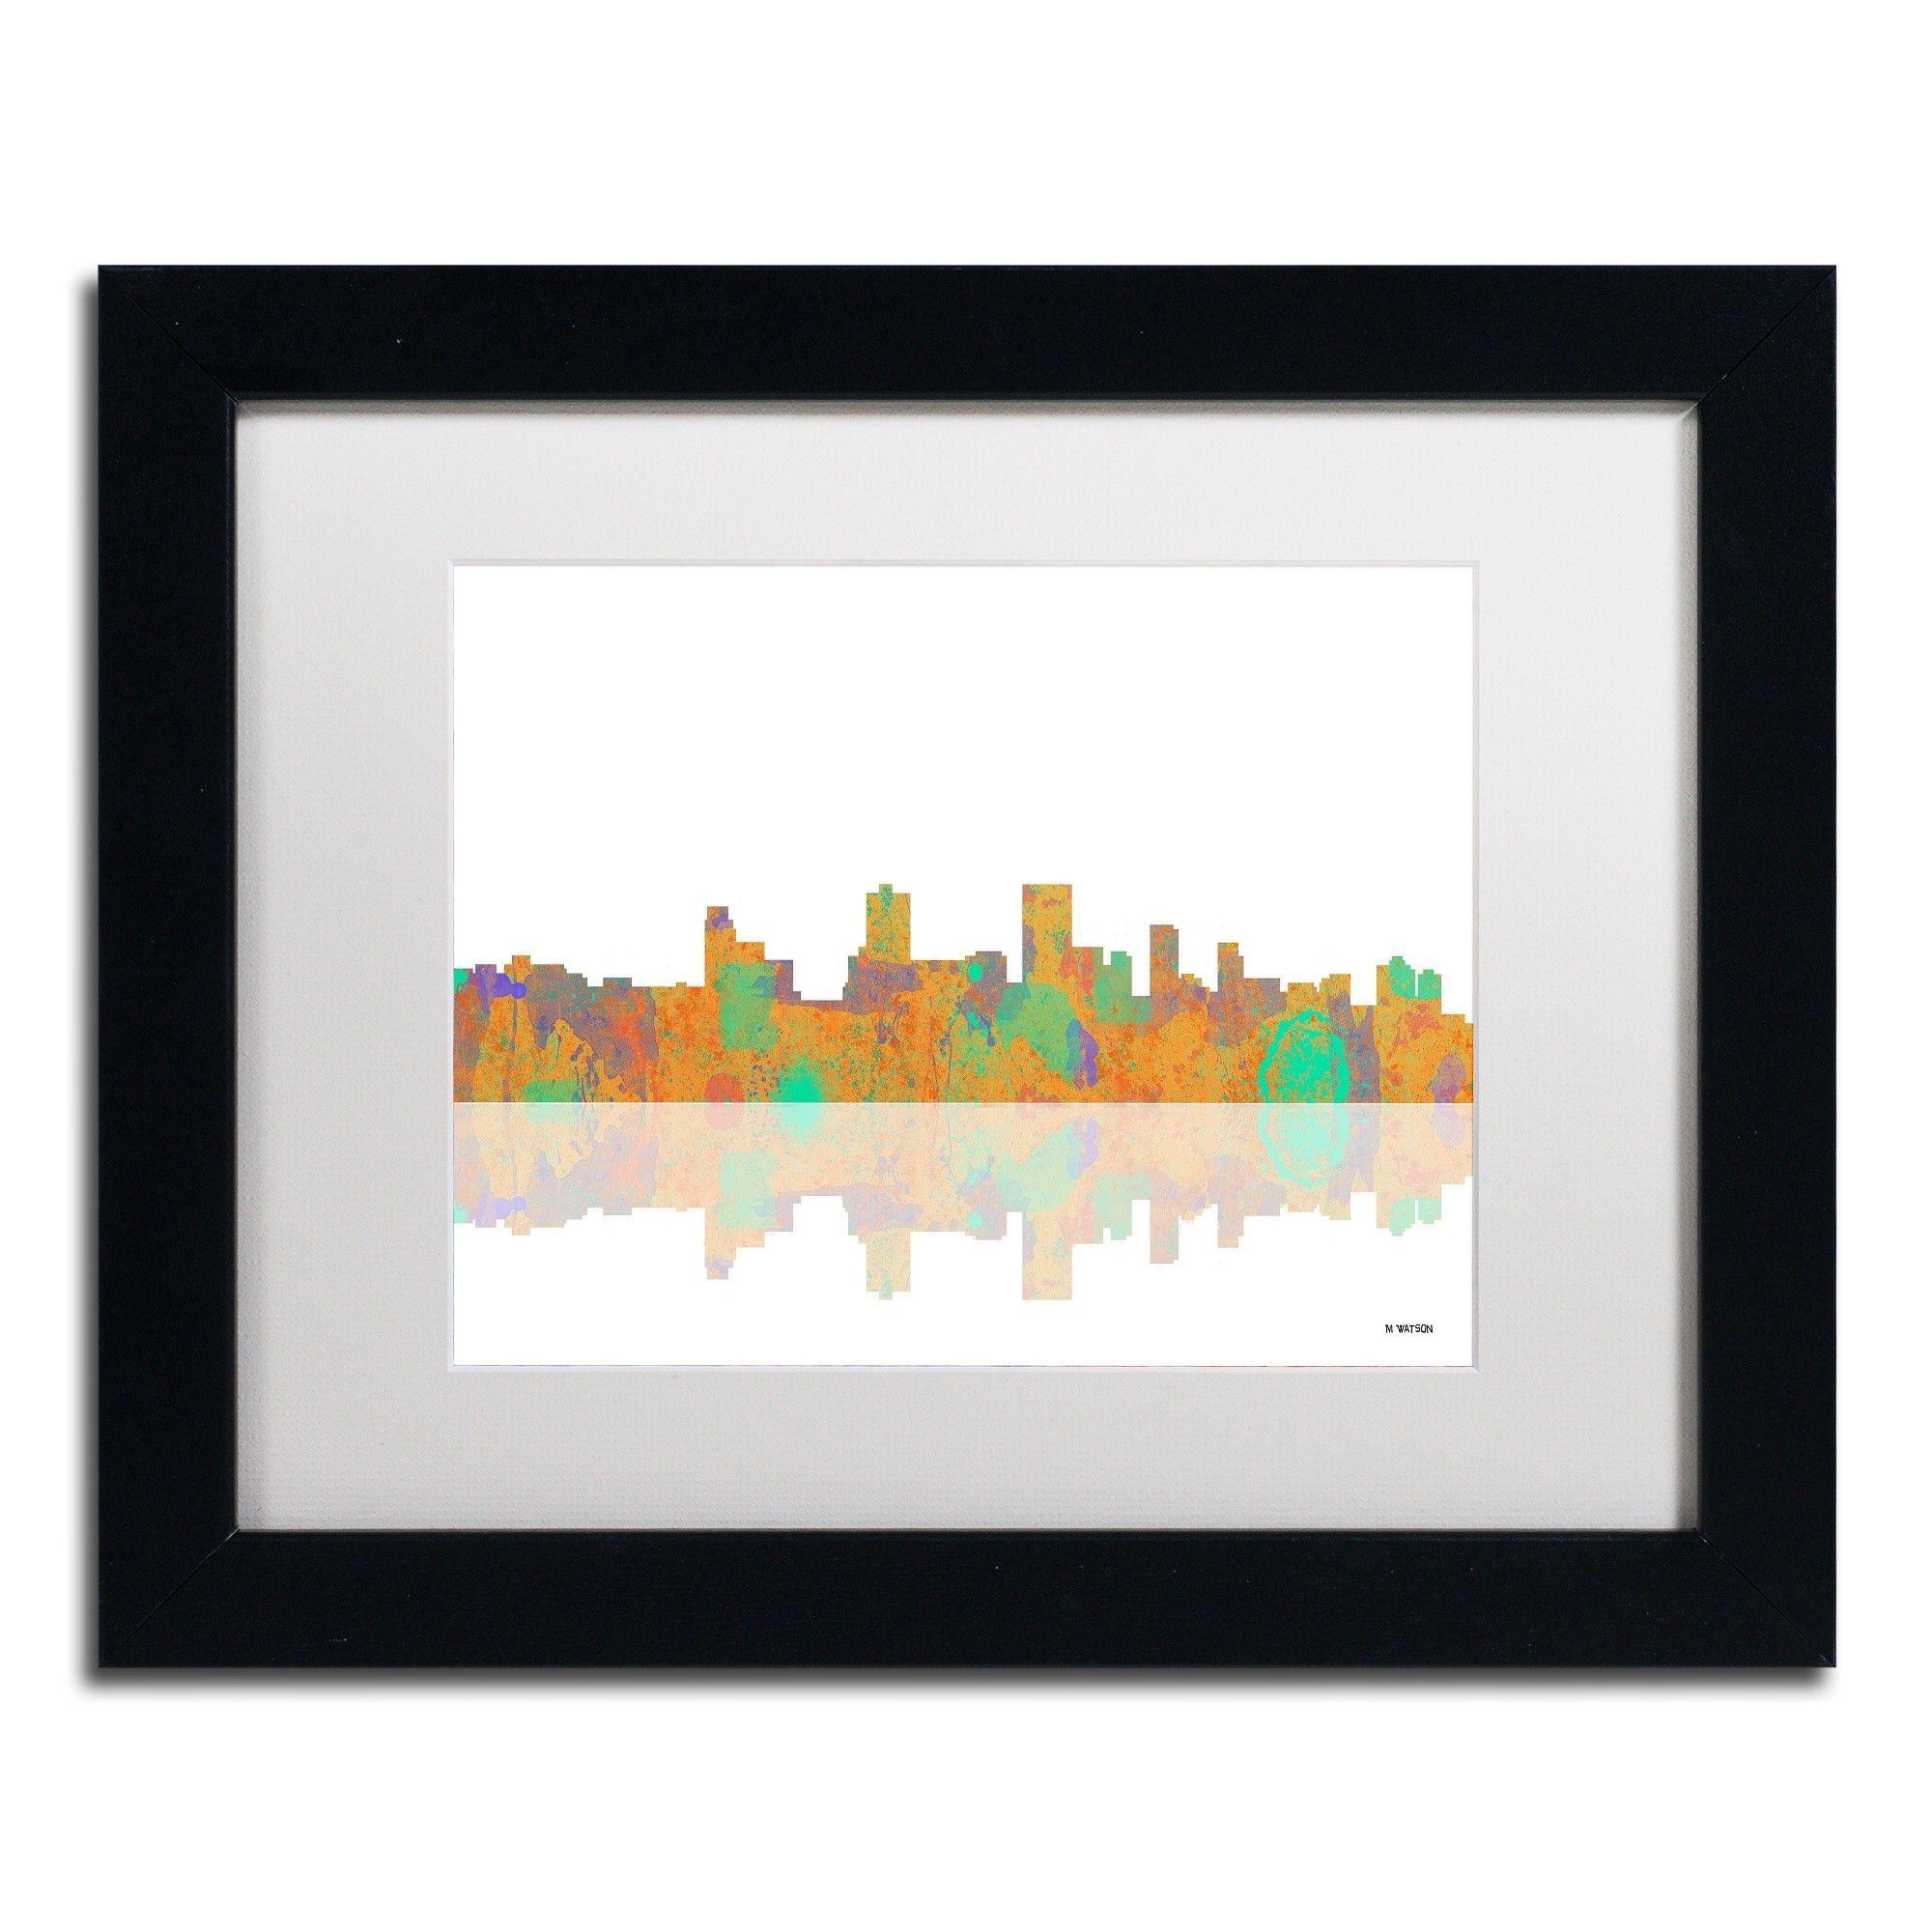 Color art anchorage - Anchorage Alaska Skyline Iii By Marlene Watson Framed Graphic Art